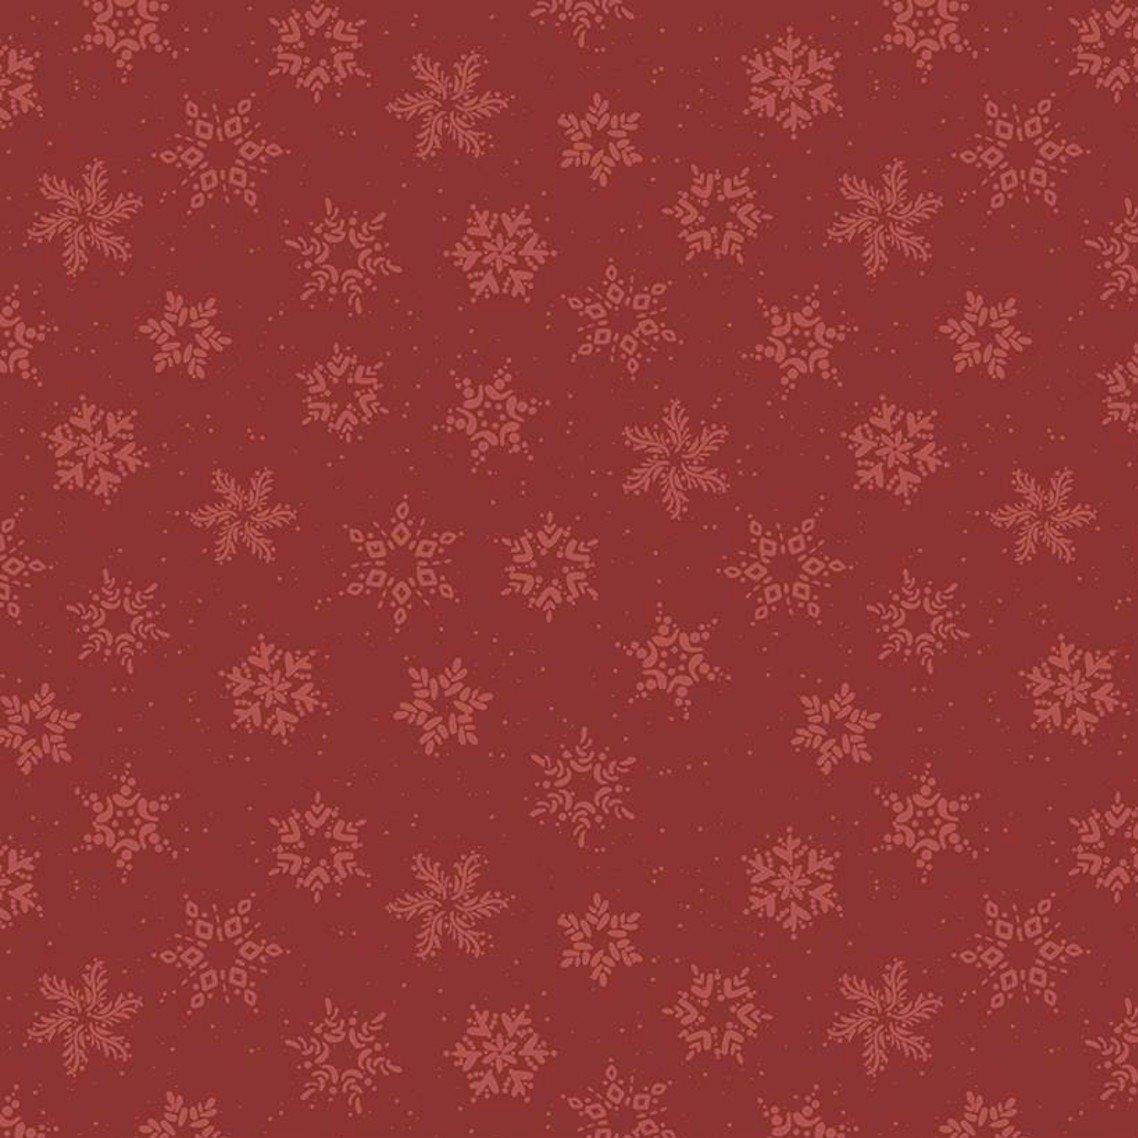 Amanda Castor Winterland - Snowflakes (Red)